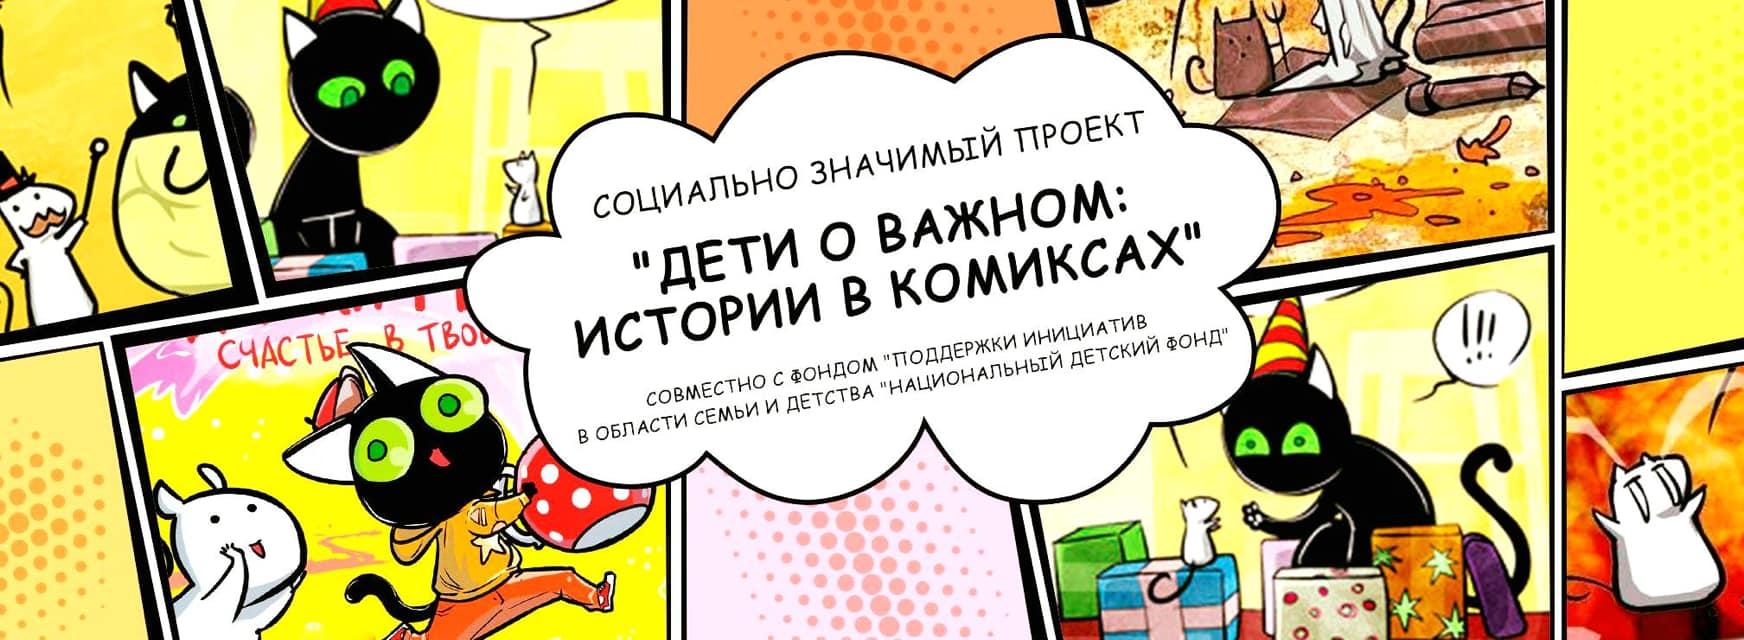 Онлайн комикс-марафон в Инстаграм